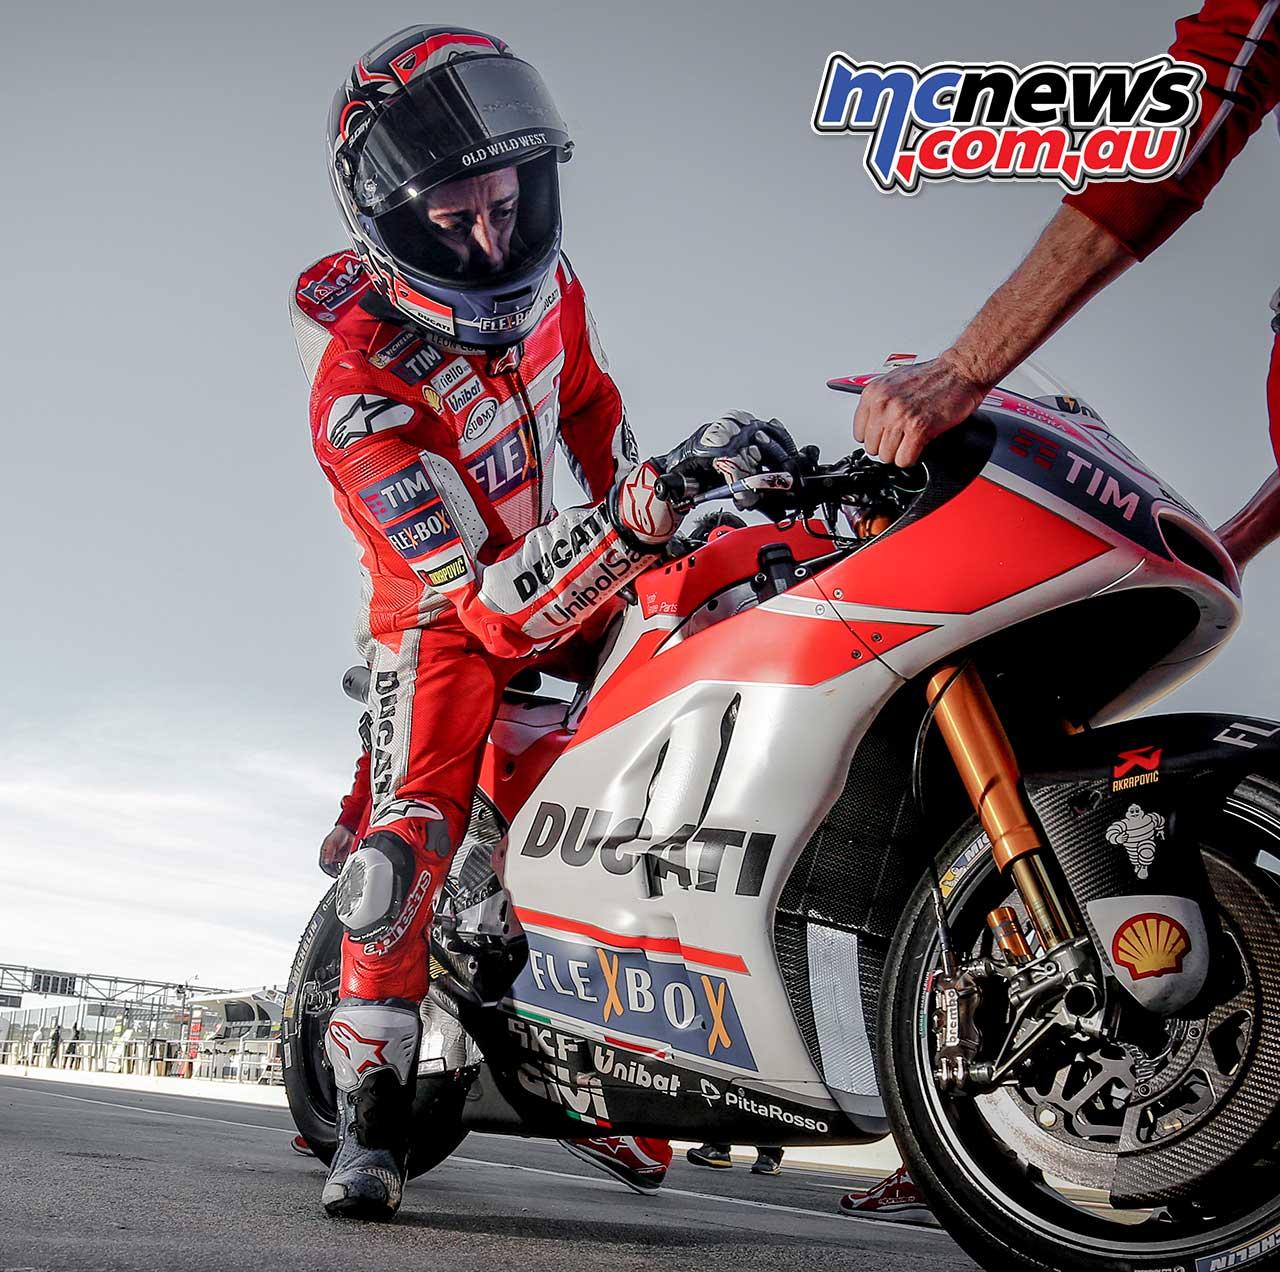 Motogp 2018: MotoGP Riders Reflect On Valencia MotoGP Test